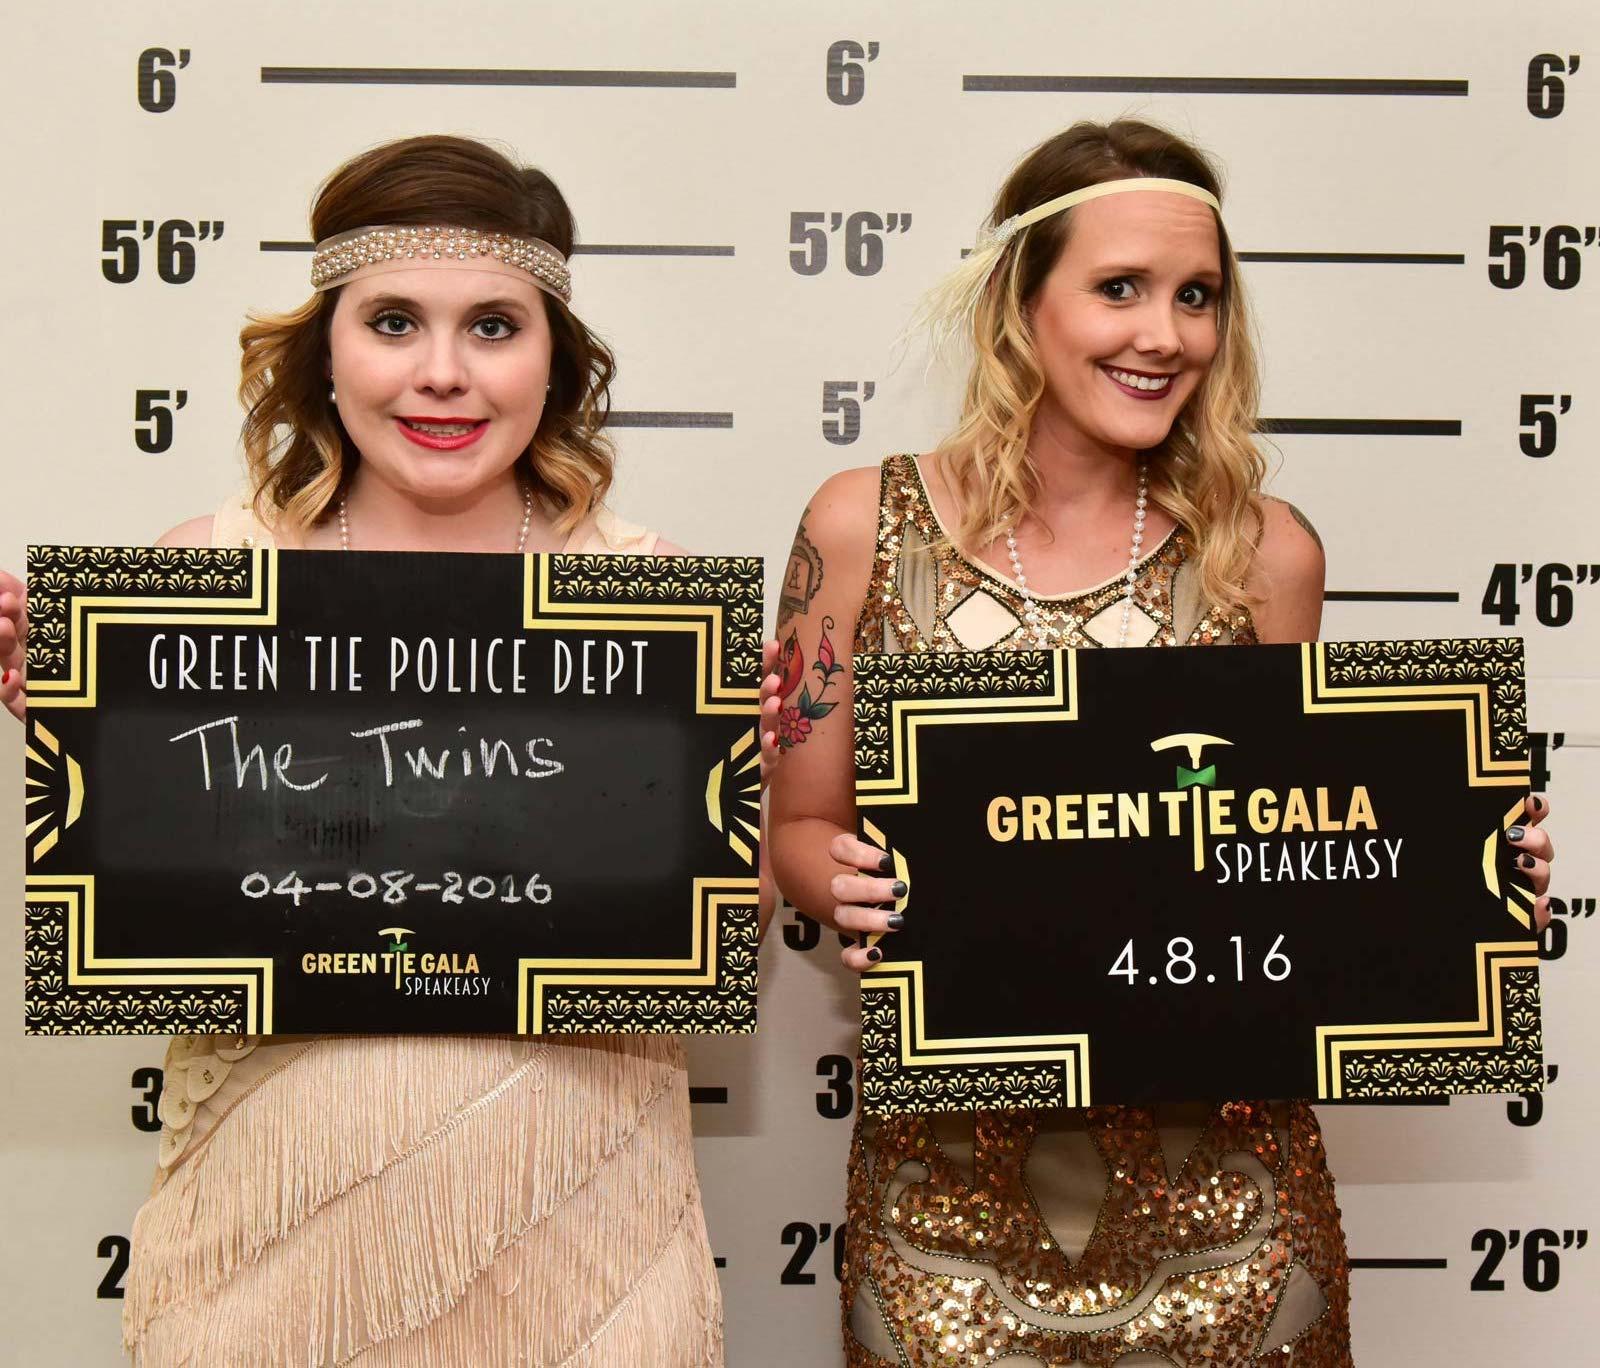 Green Tie Gala attendees